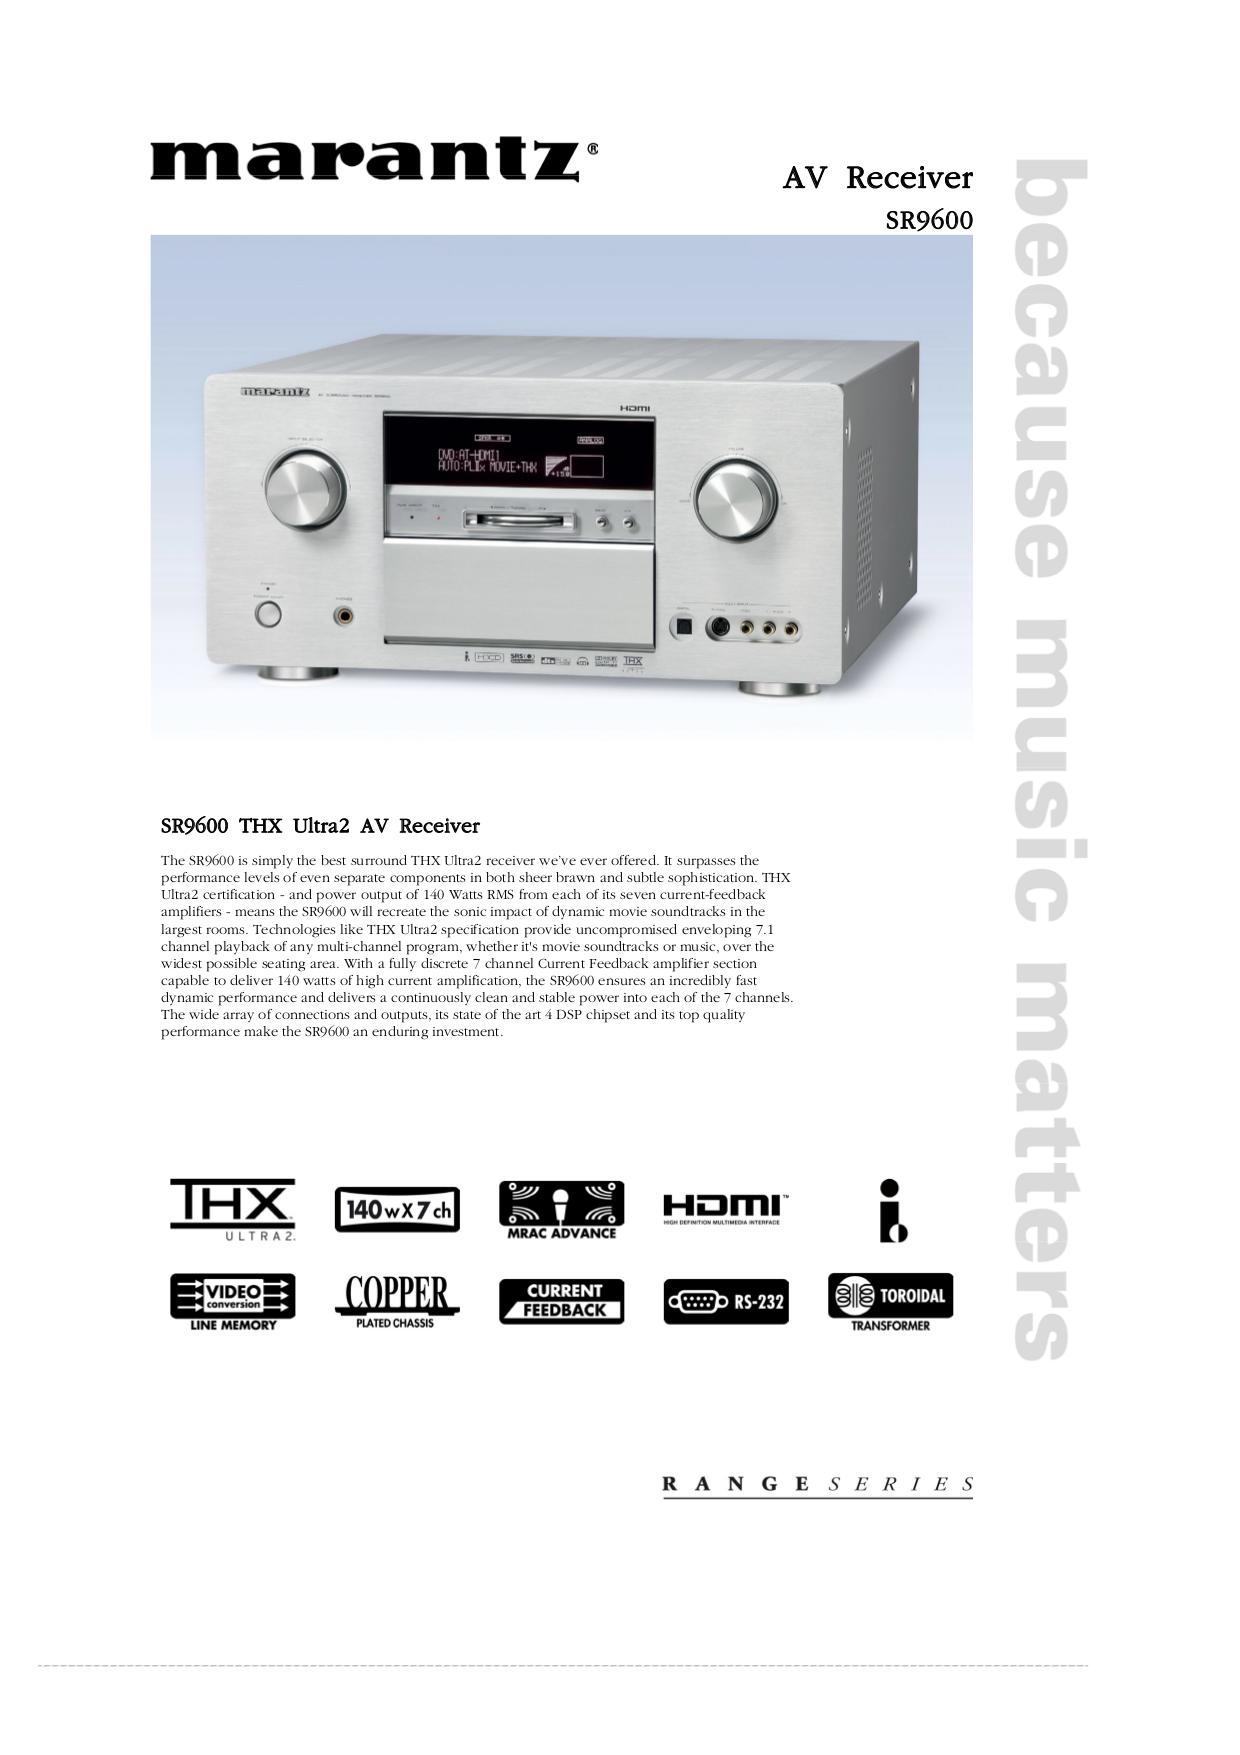 download free pdf for marantz sr9600 receiver manual rh umlib com marantz sr9600 user manual Marantz SR9600 THX Ultra2